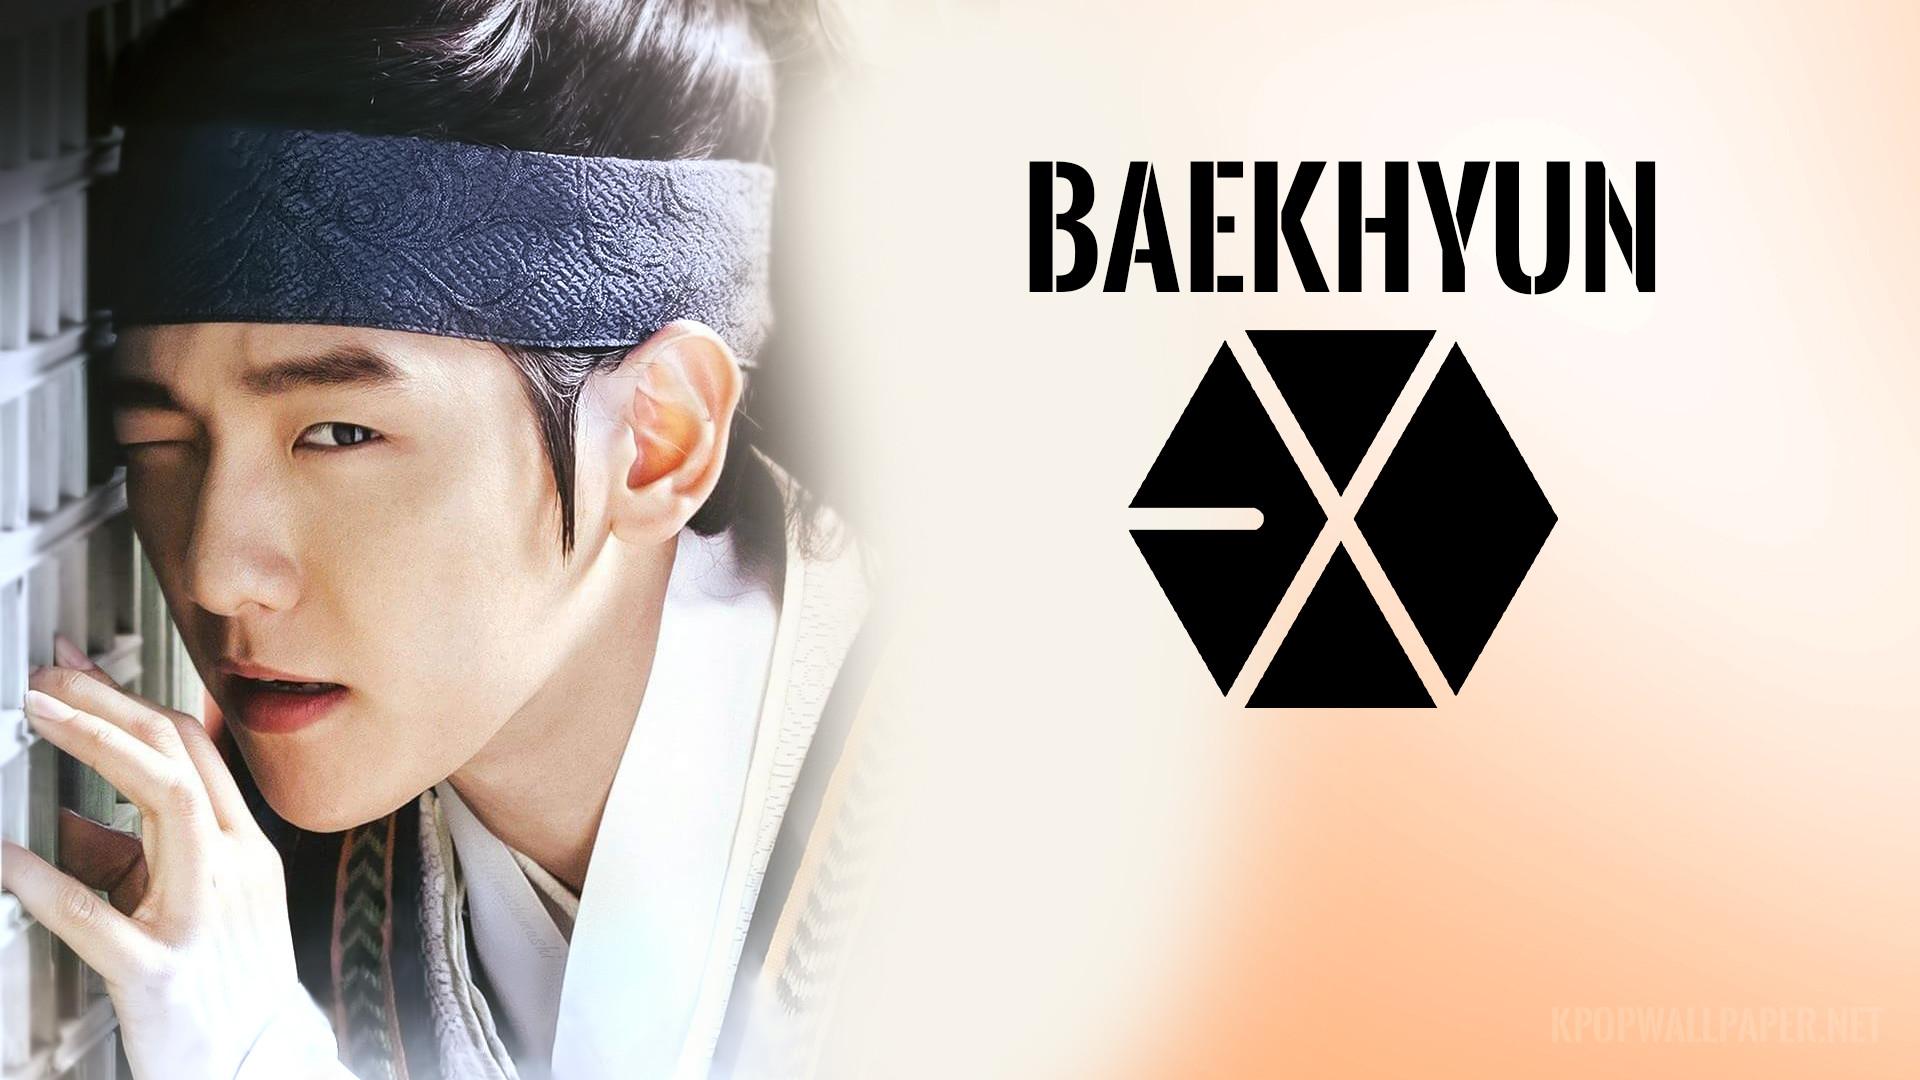 Baekhyun Wallpapers 84 Images